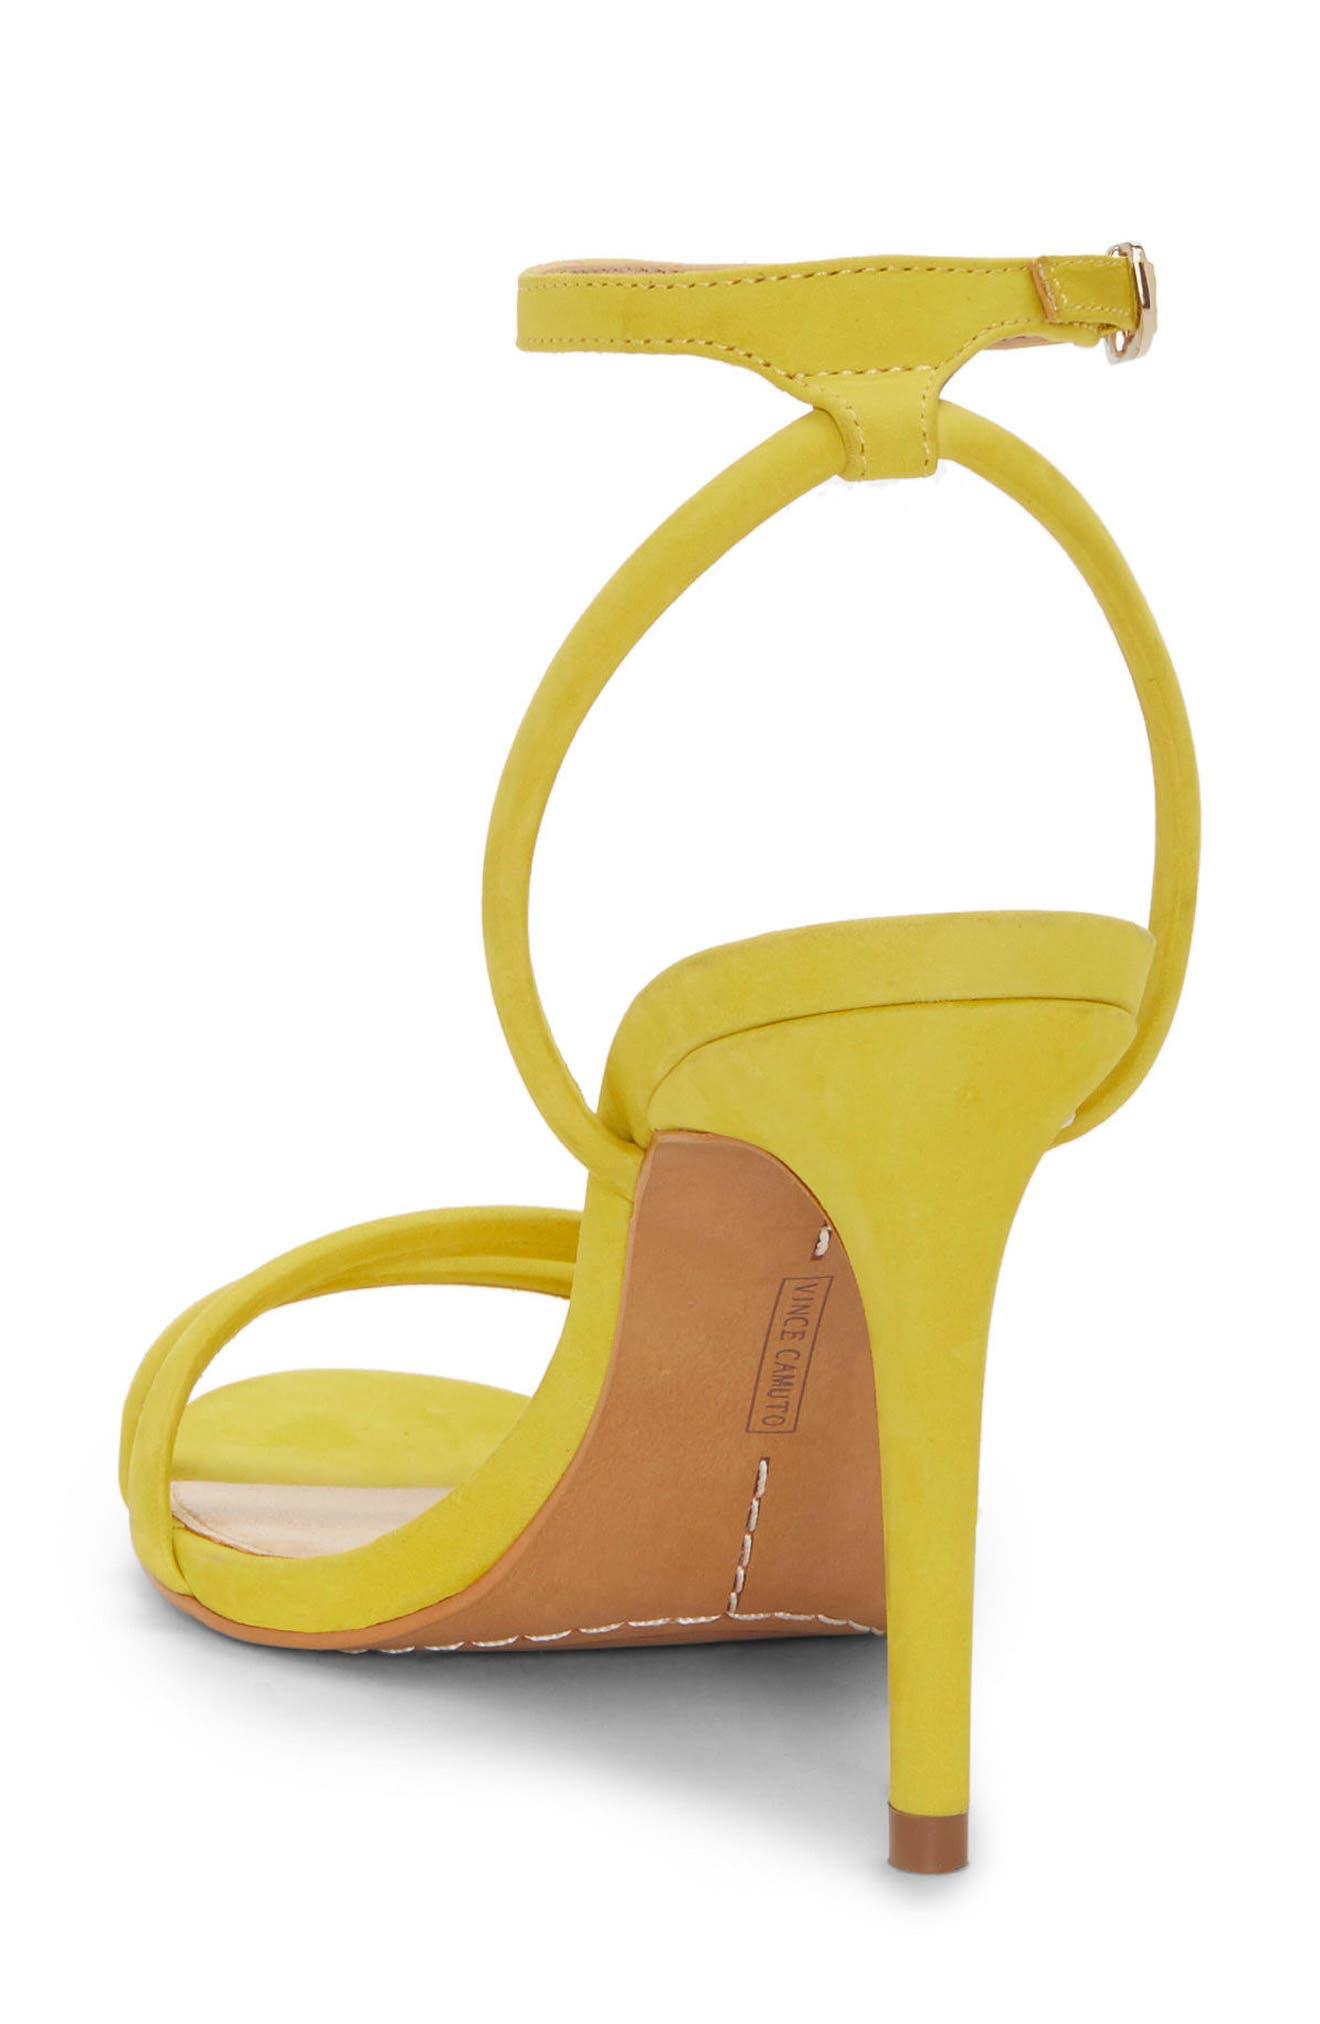 Kareenat Sandal,                             Alternate thumbnail 2, color,                             Yellow Nubuck Leather